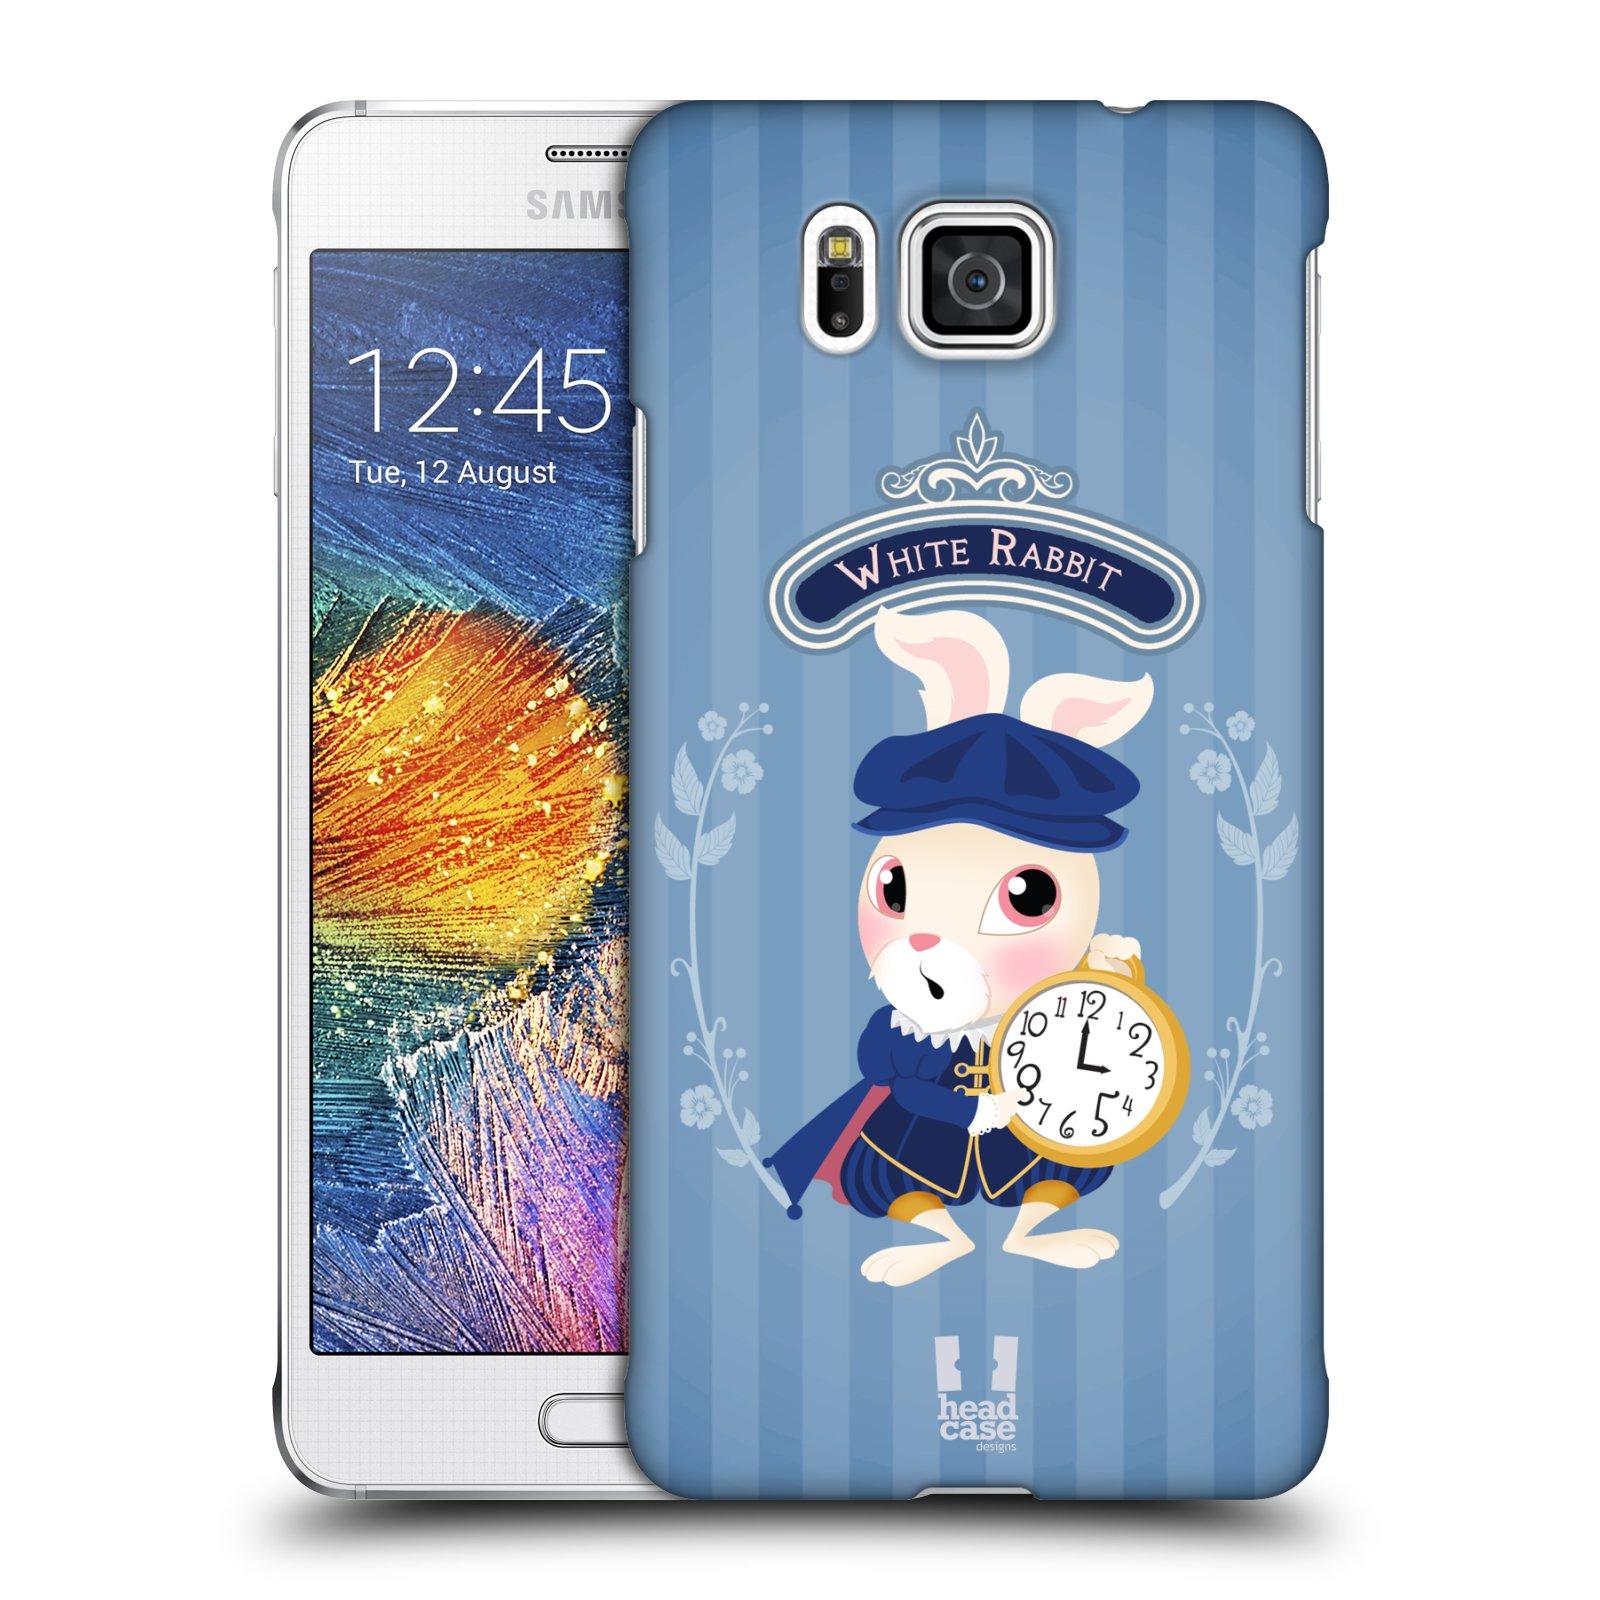 HEAD CASE plastový obal na mobil SAMSUNG Galaxy Alpha (G850) vzor Alenka v říši divů králíček